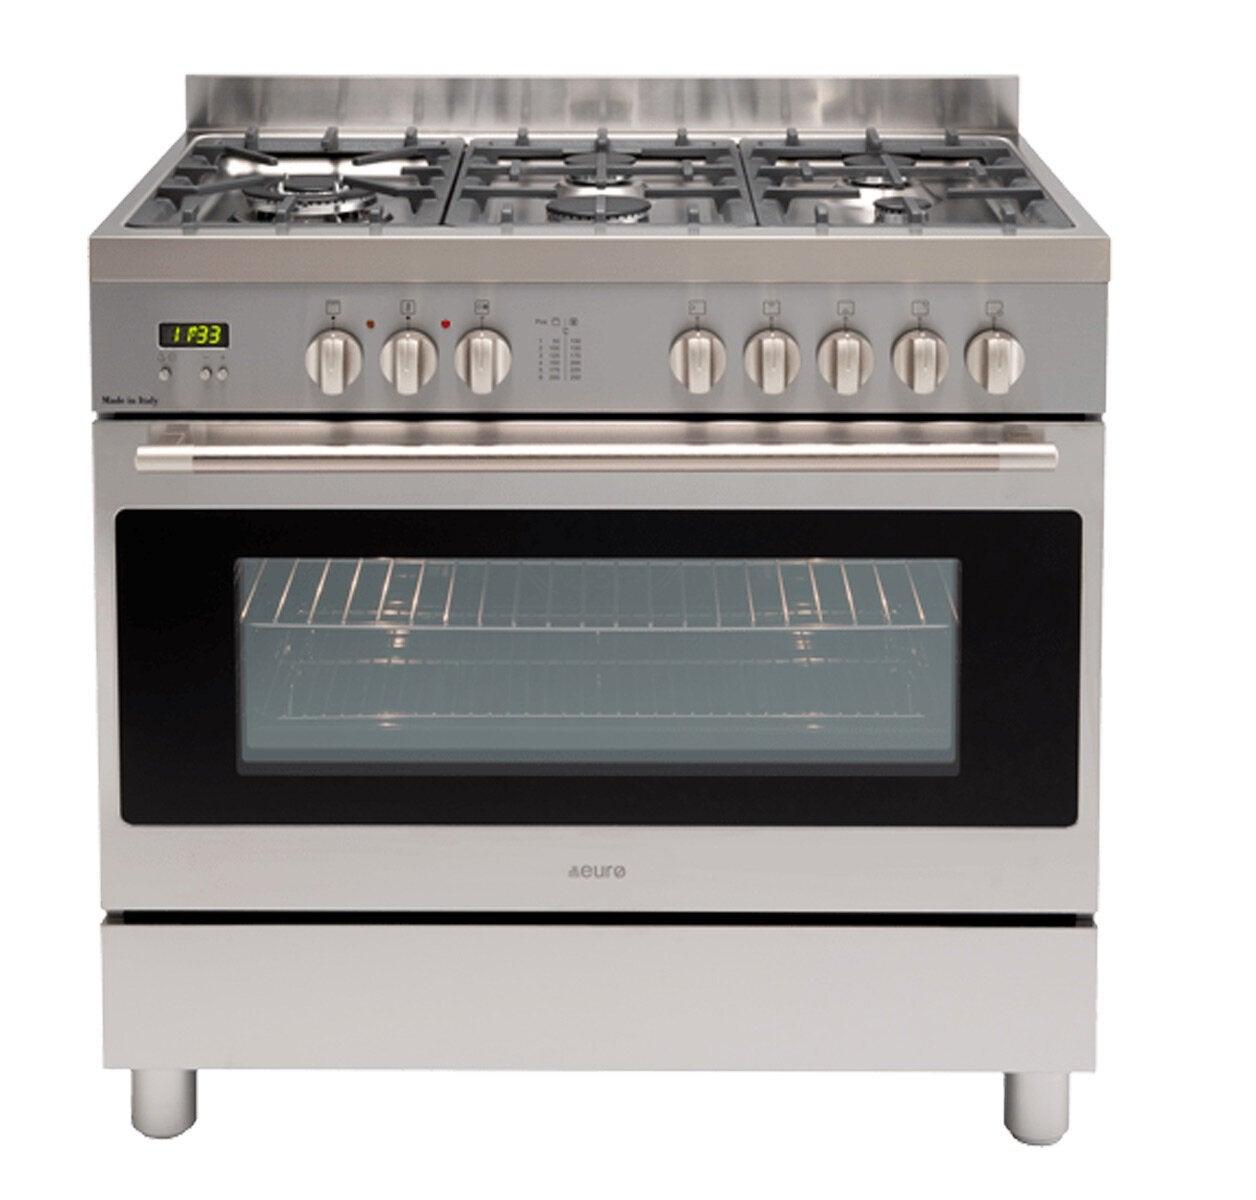 Euro Appliances EFS900GX Oven